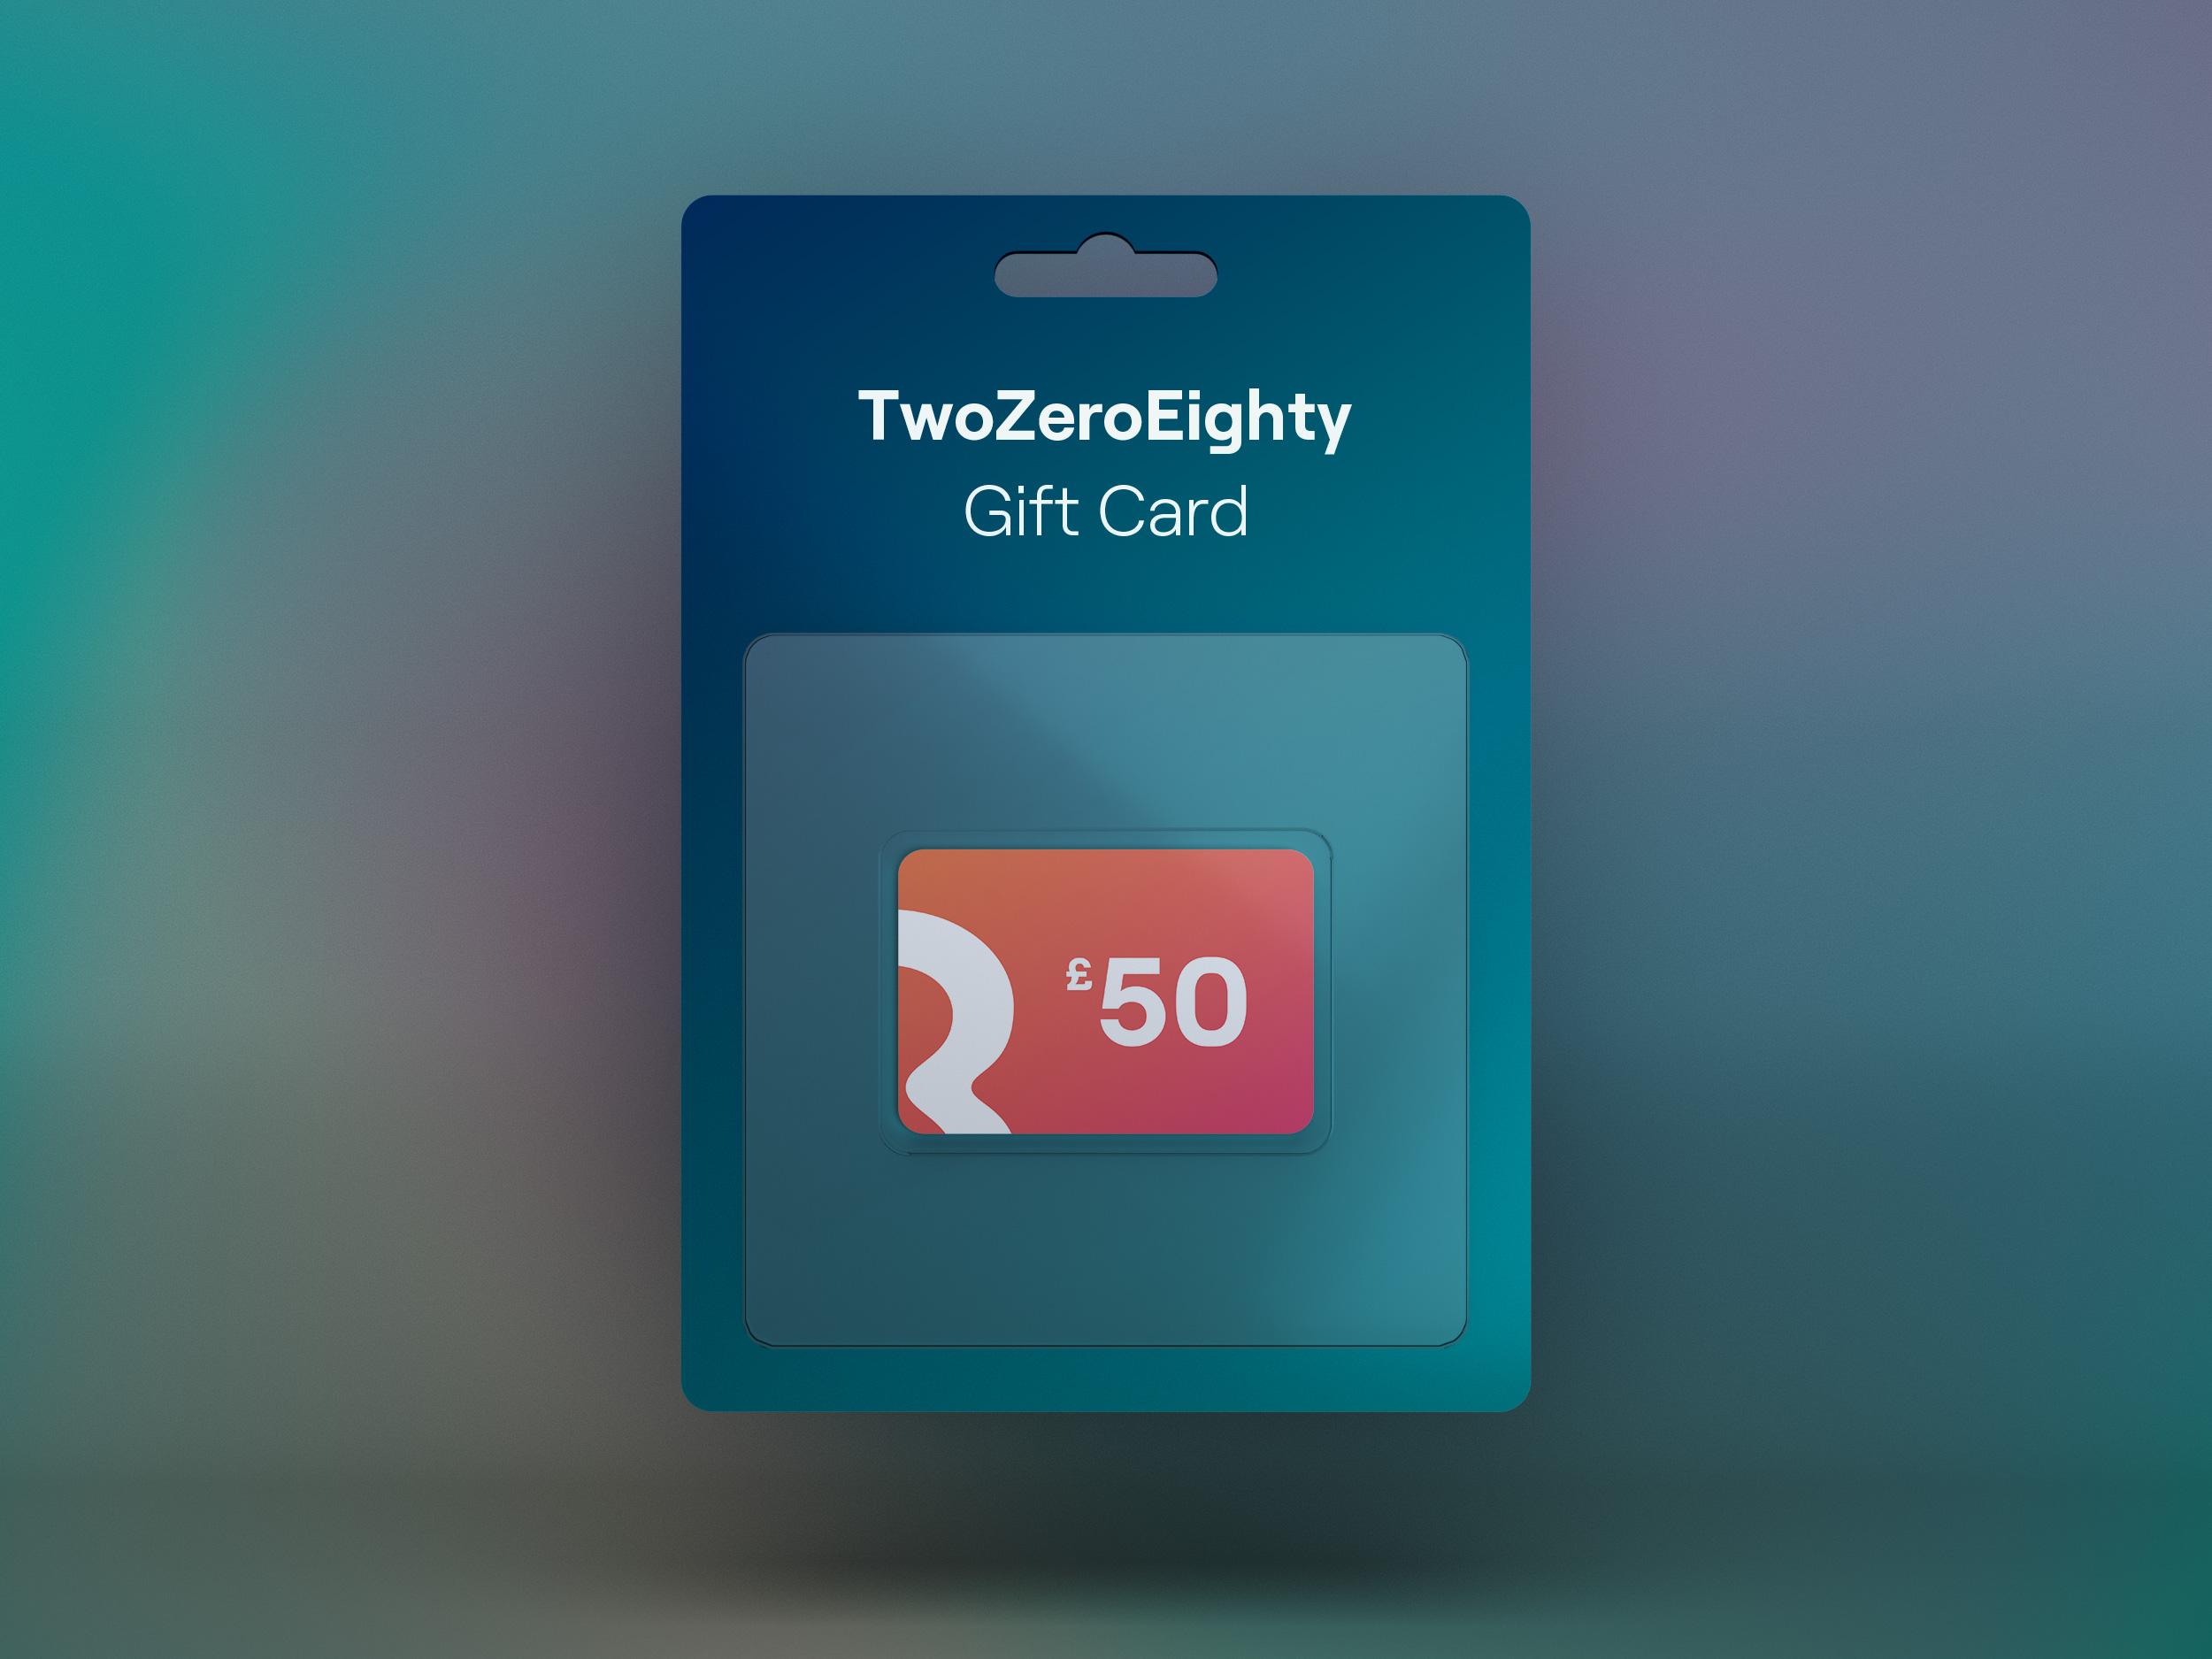 TwoZeroEighty Gift Card